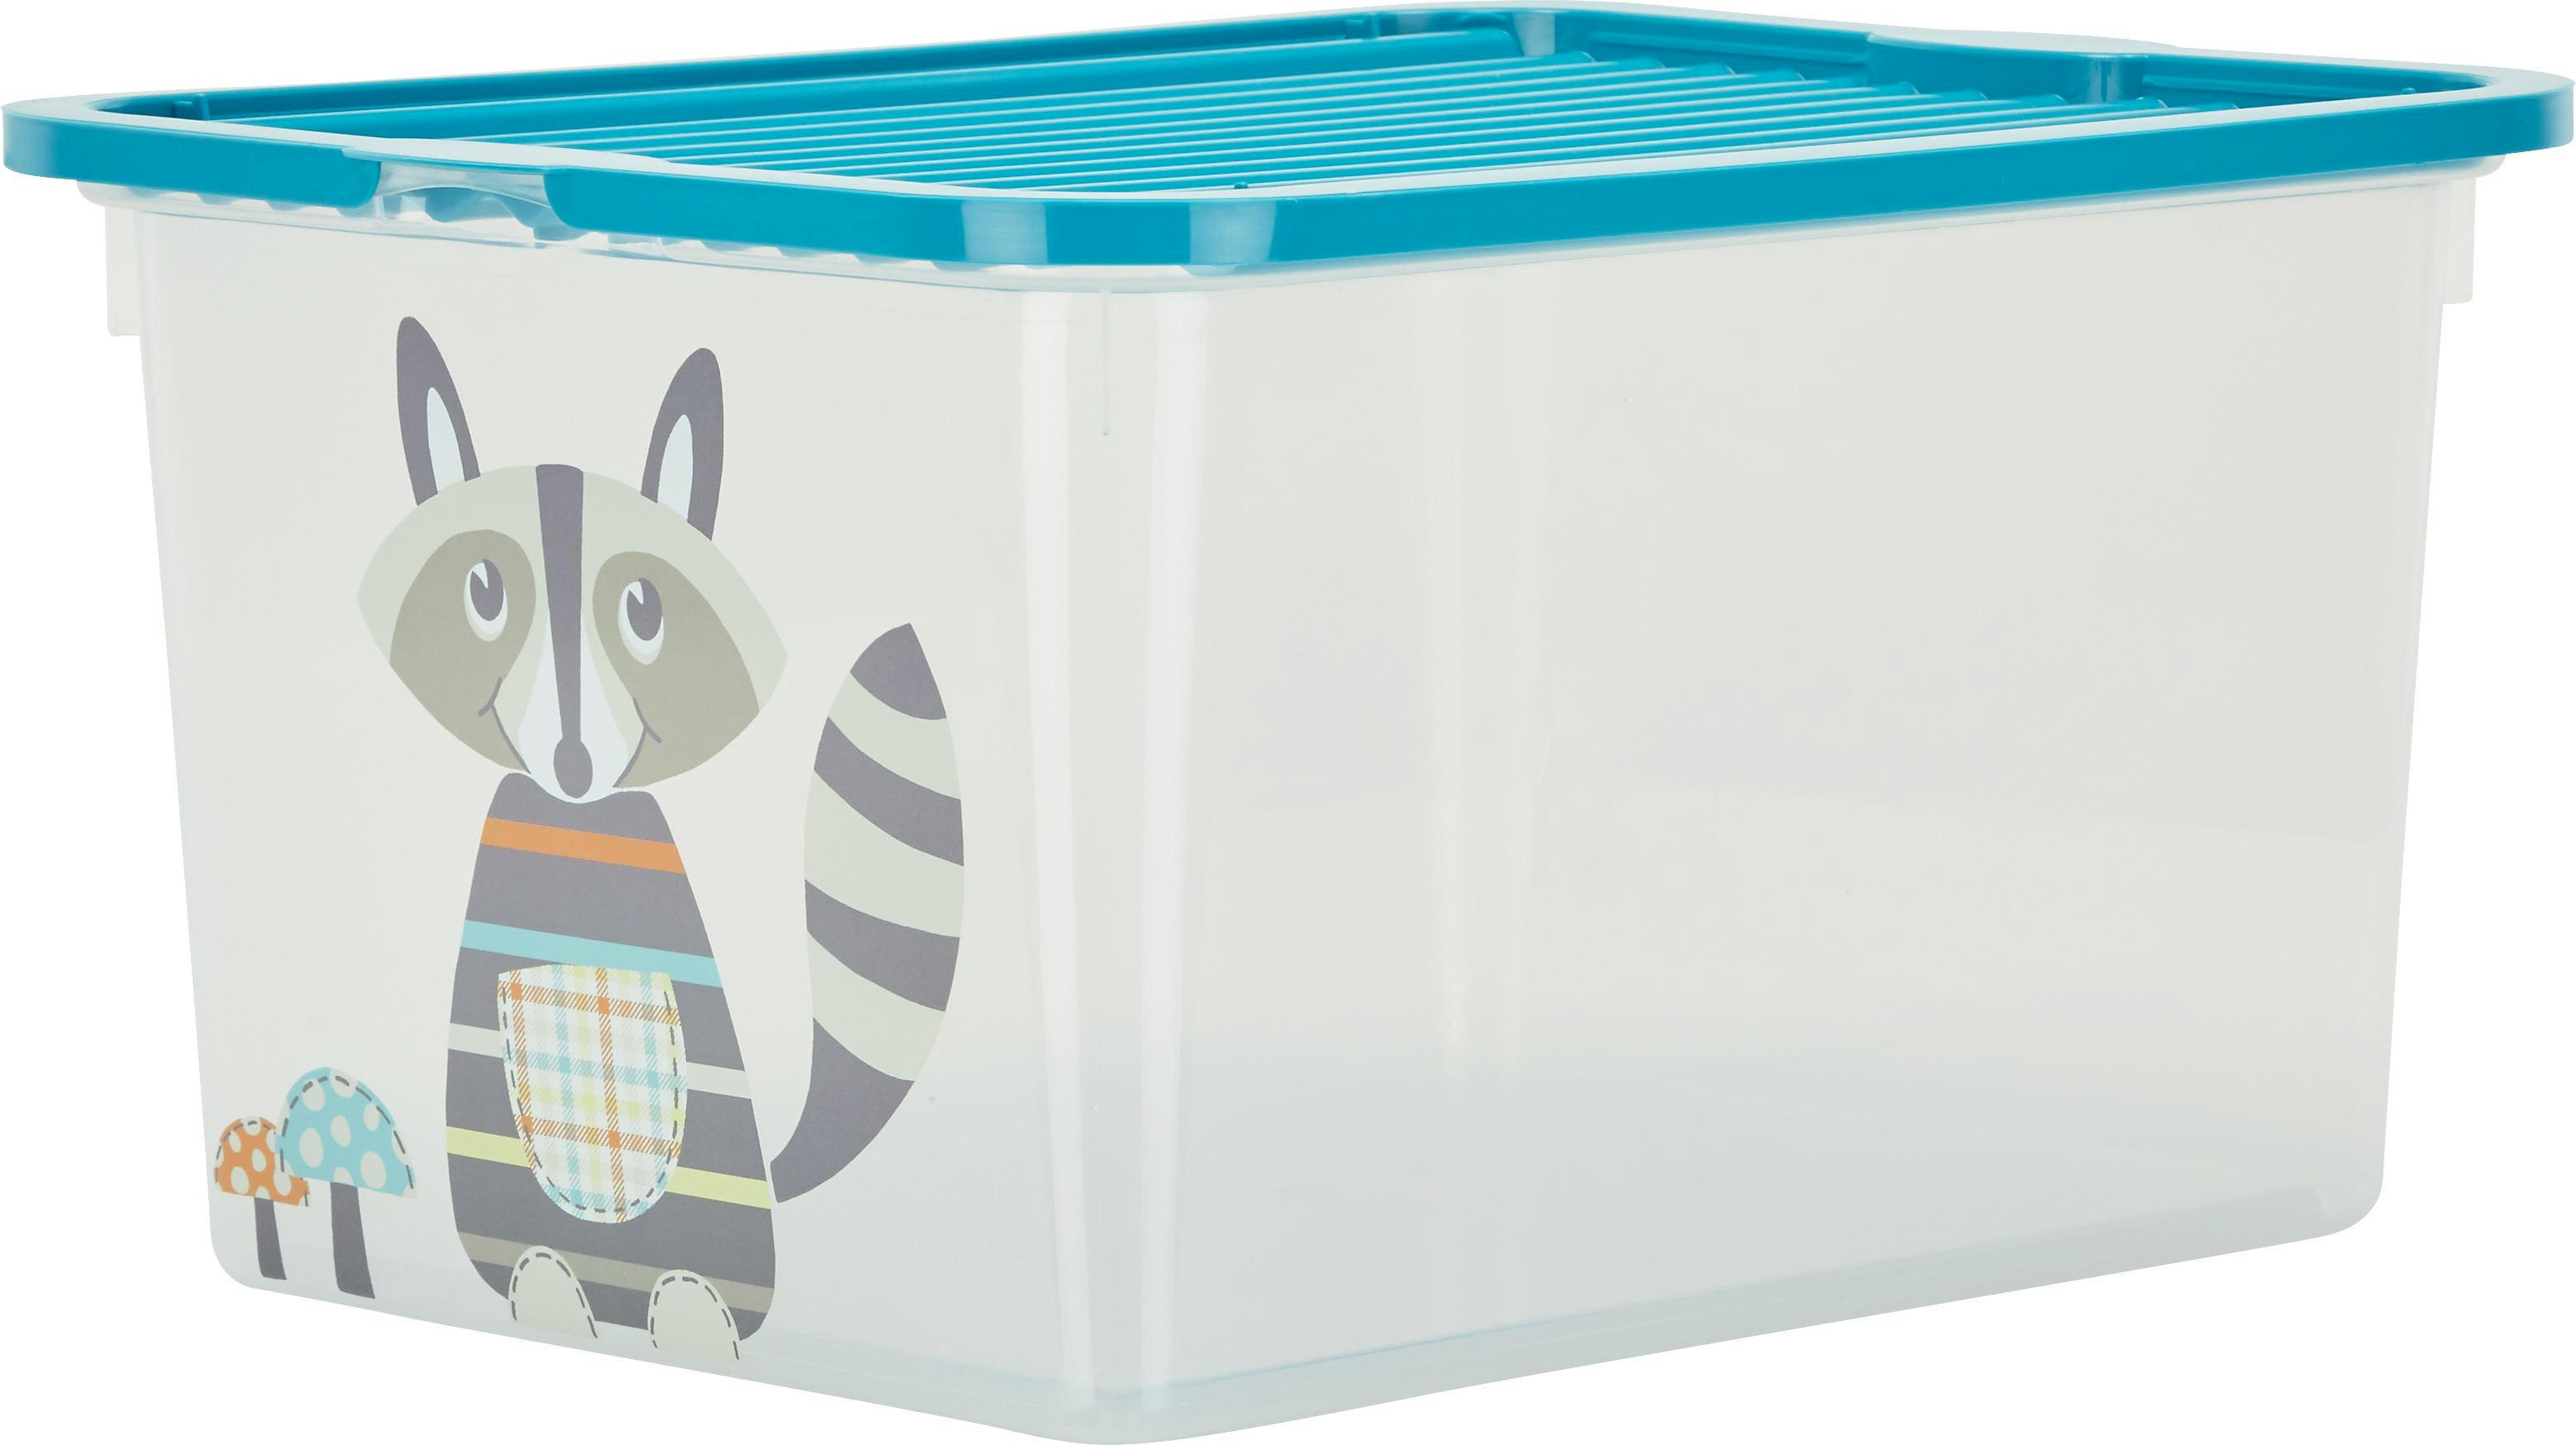 Box mit Deckel Andi aus Kunststoff - Türkis/Transparent, Kunststoff (37/27,6/20cm)